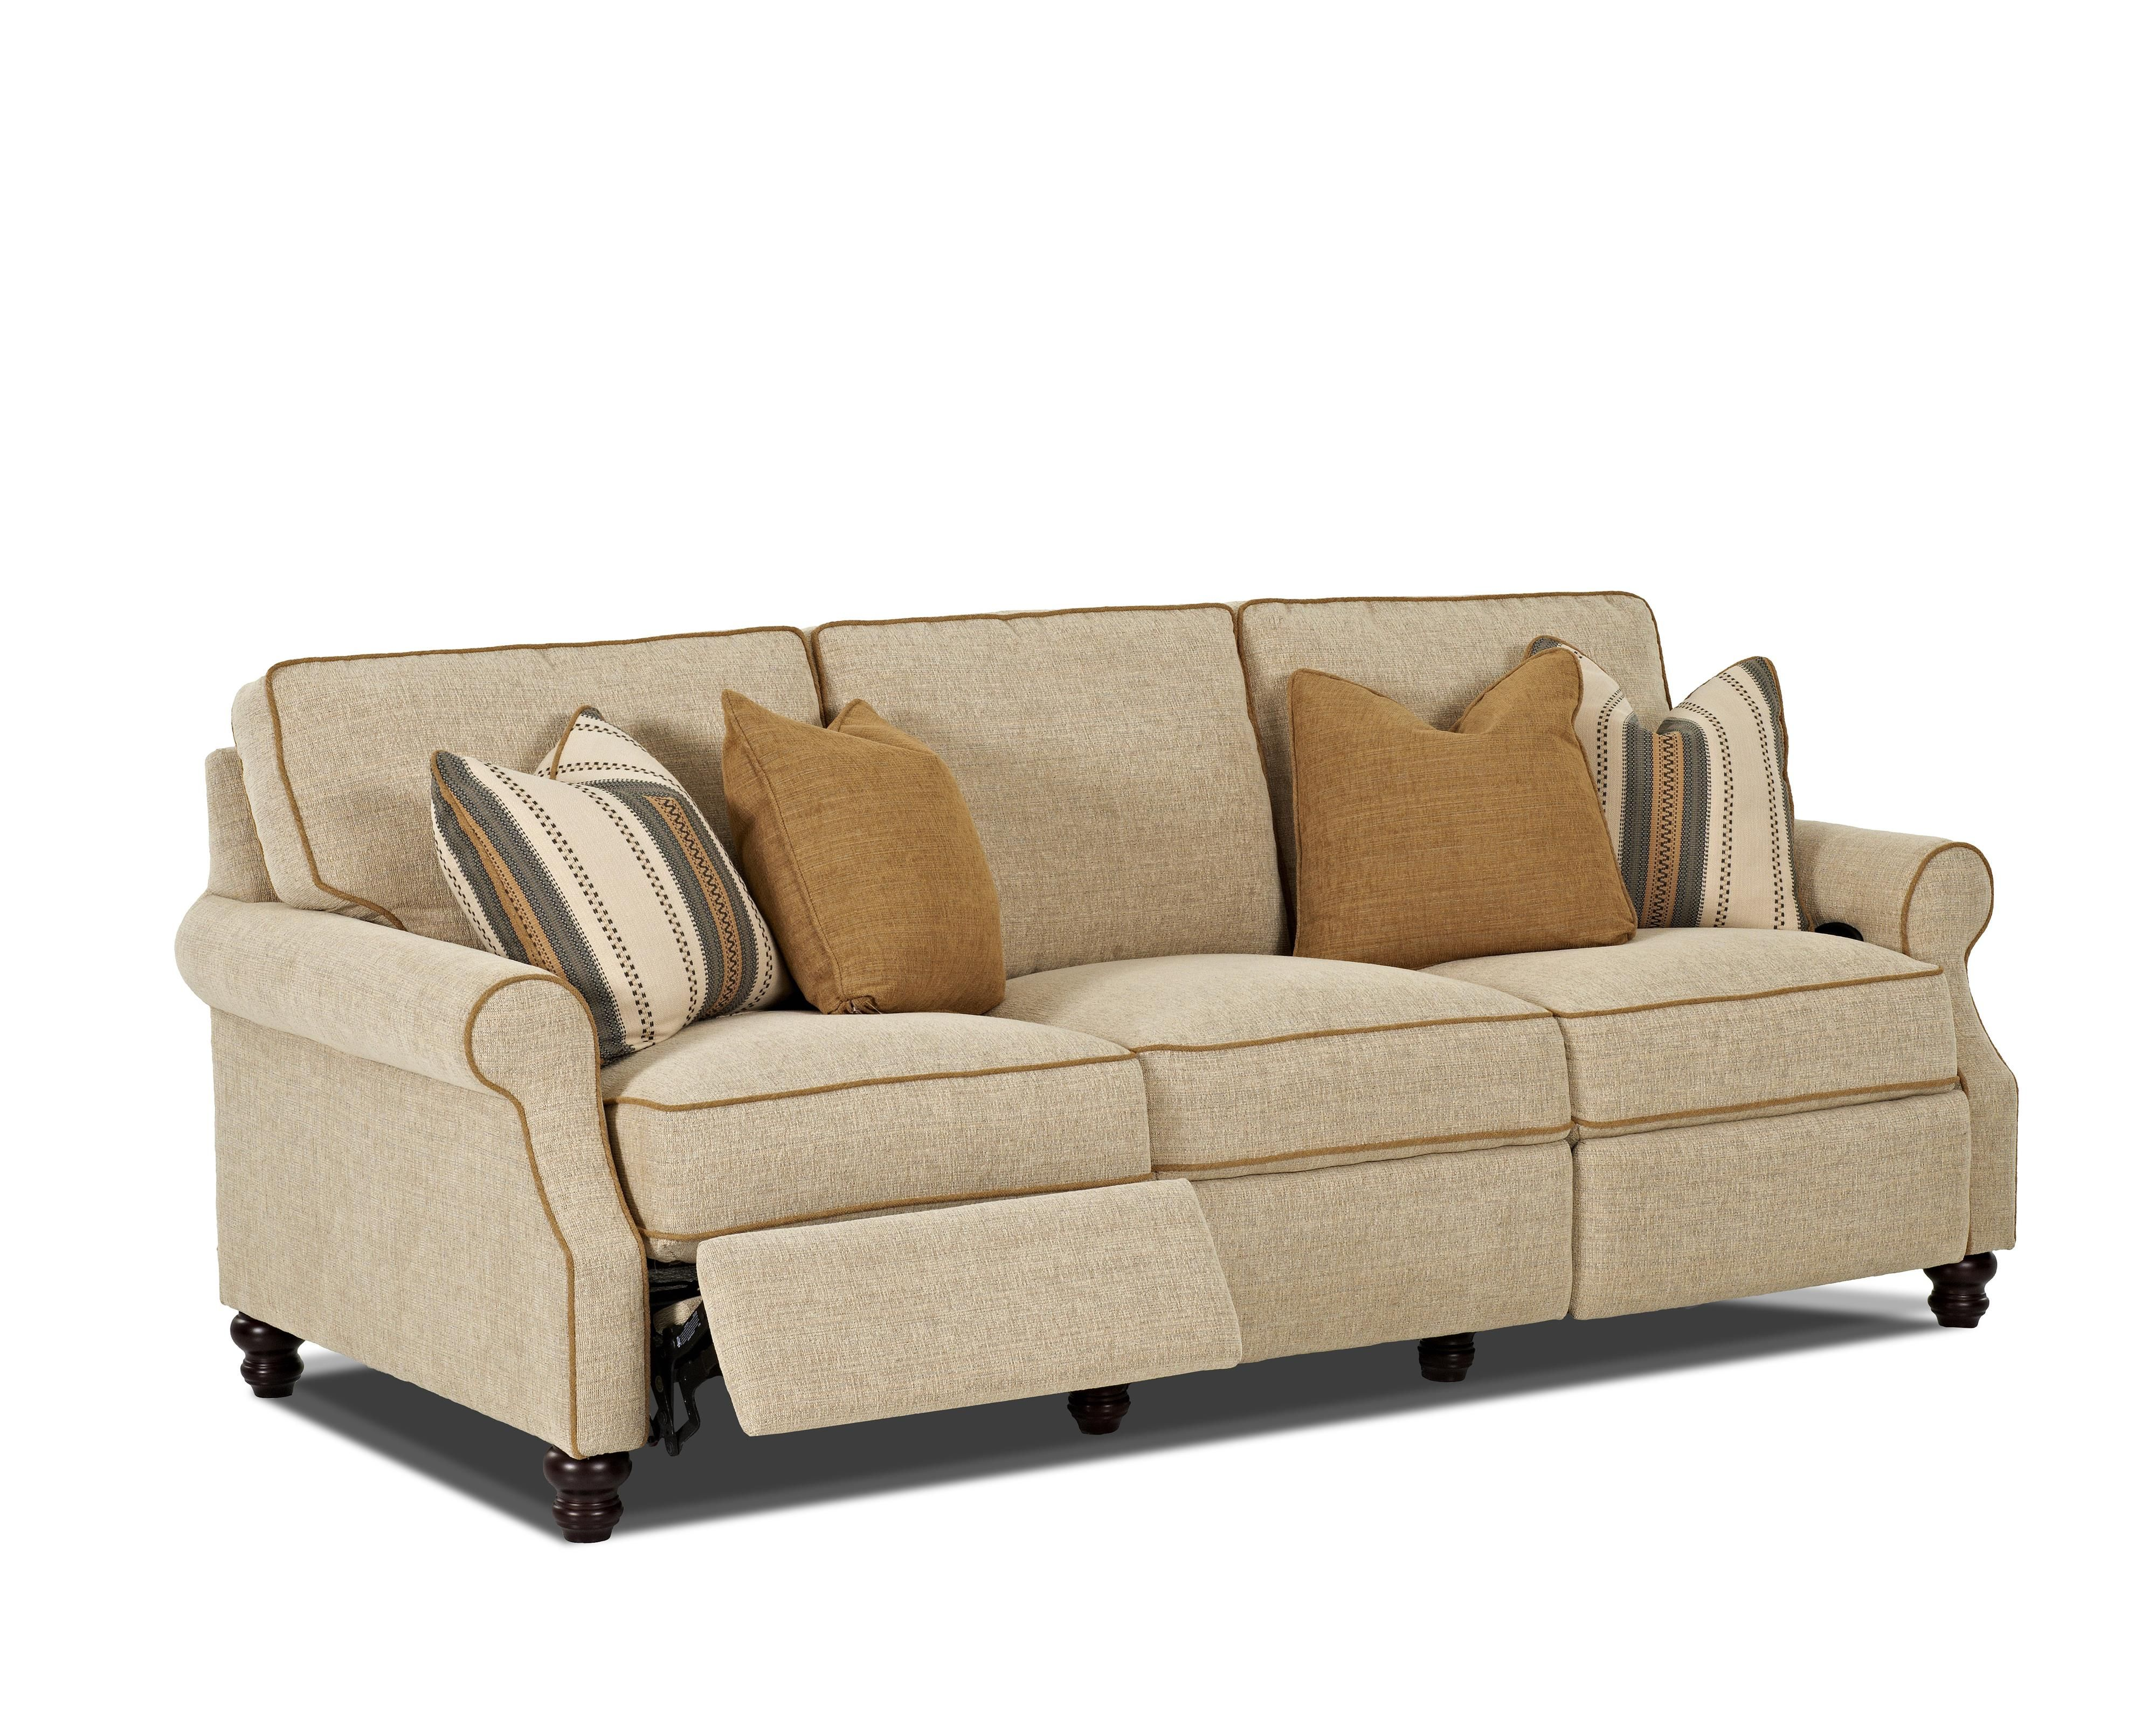 Tricia Power Hybrid Reclining Sofa